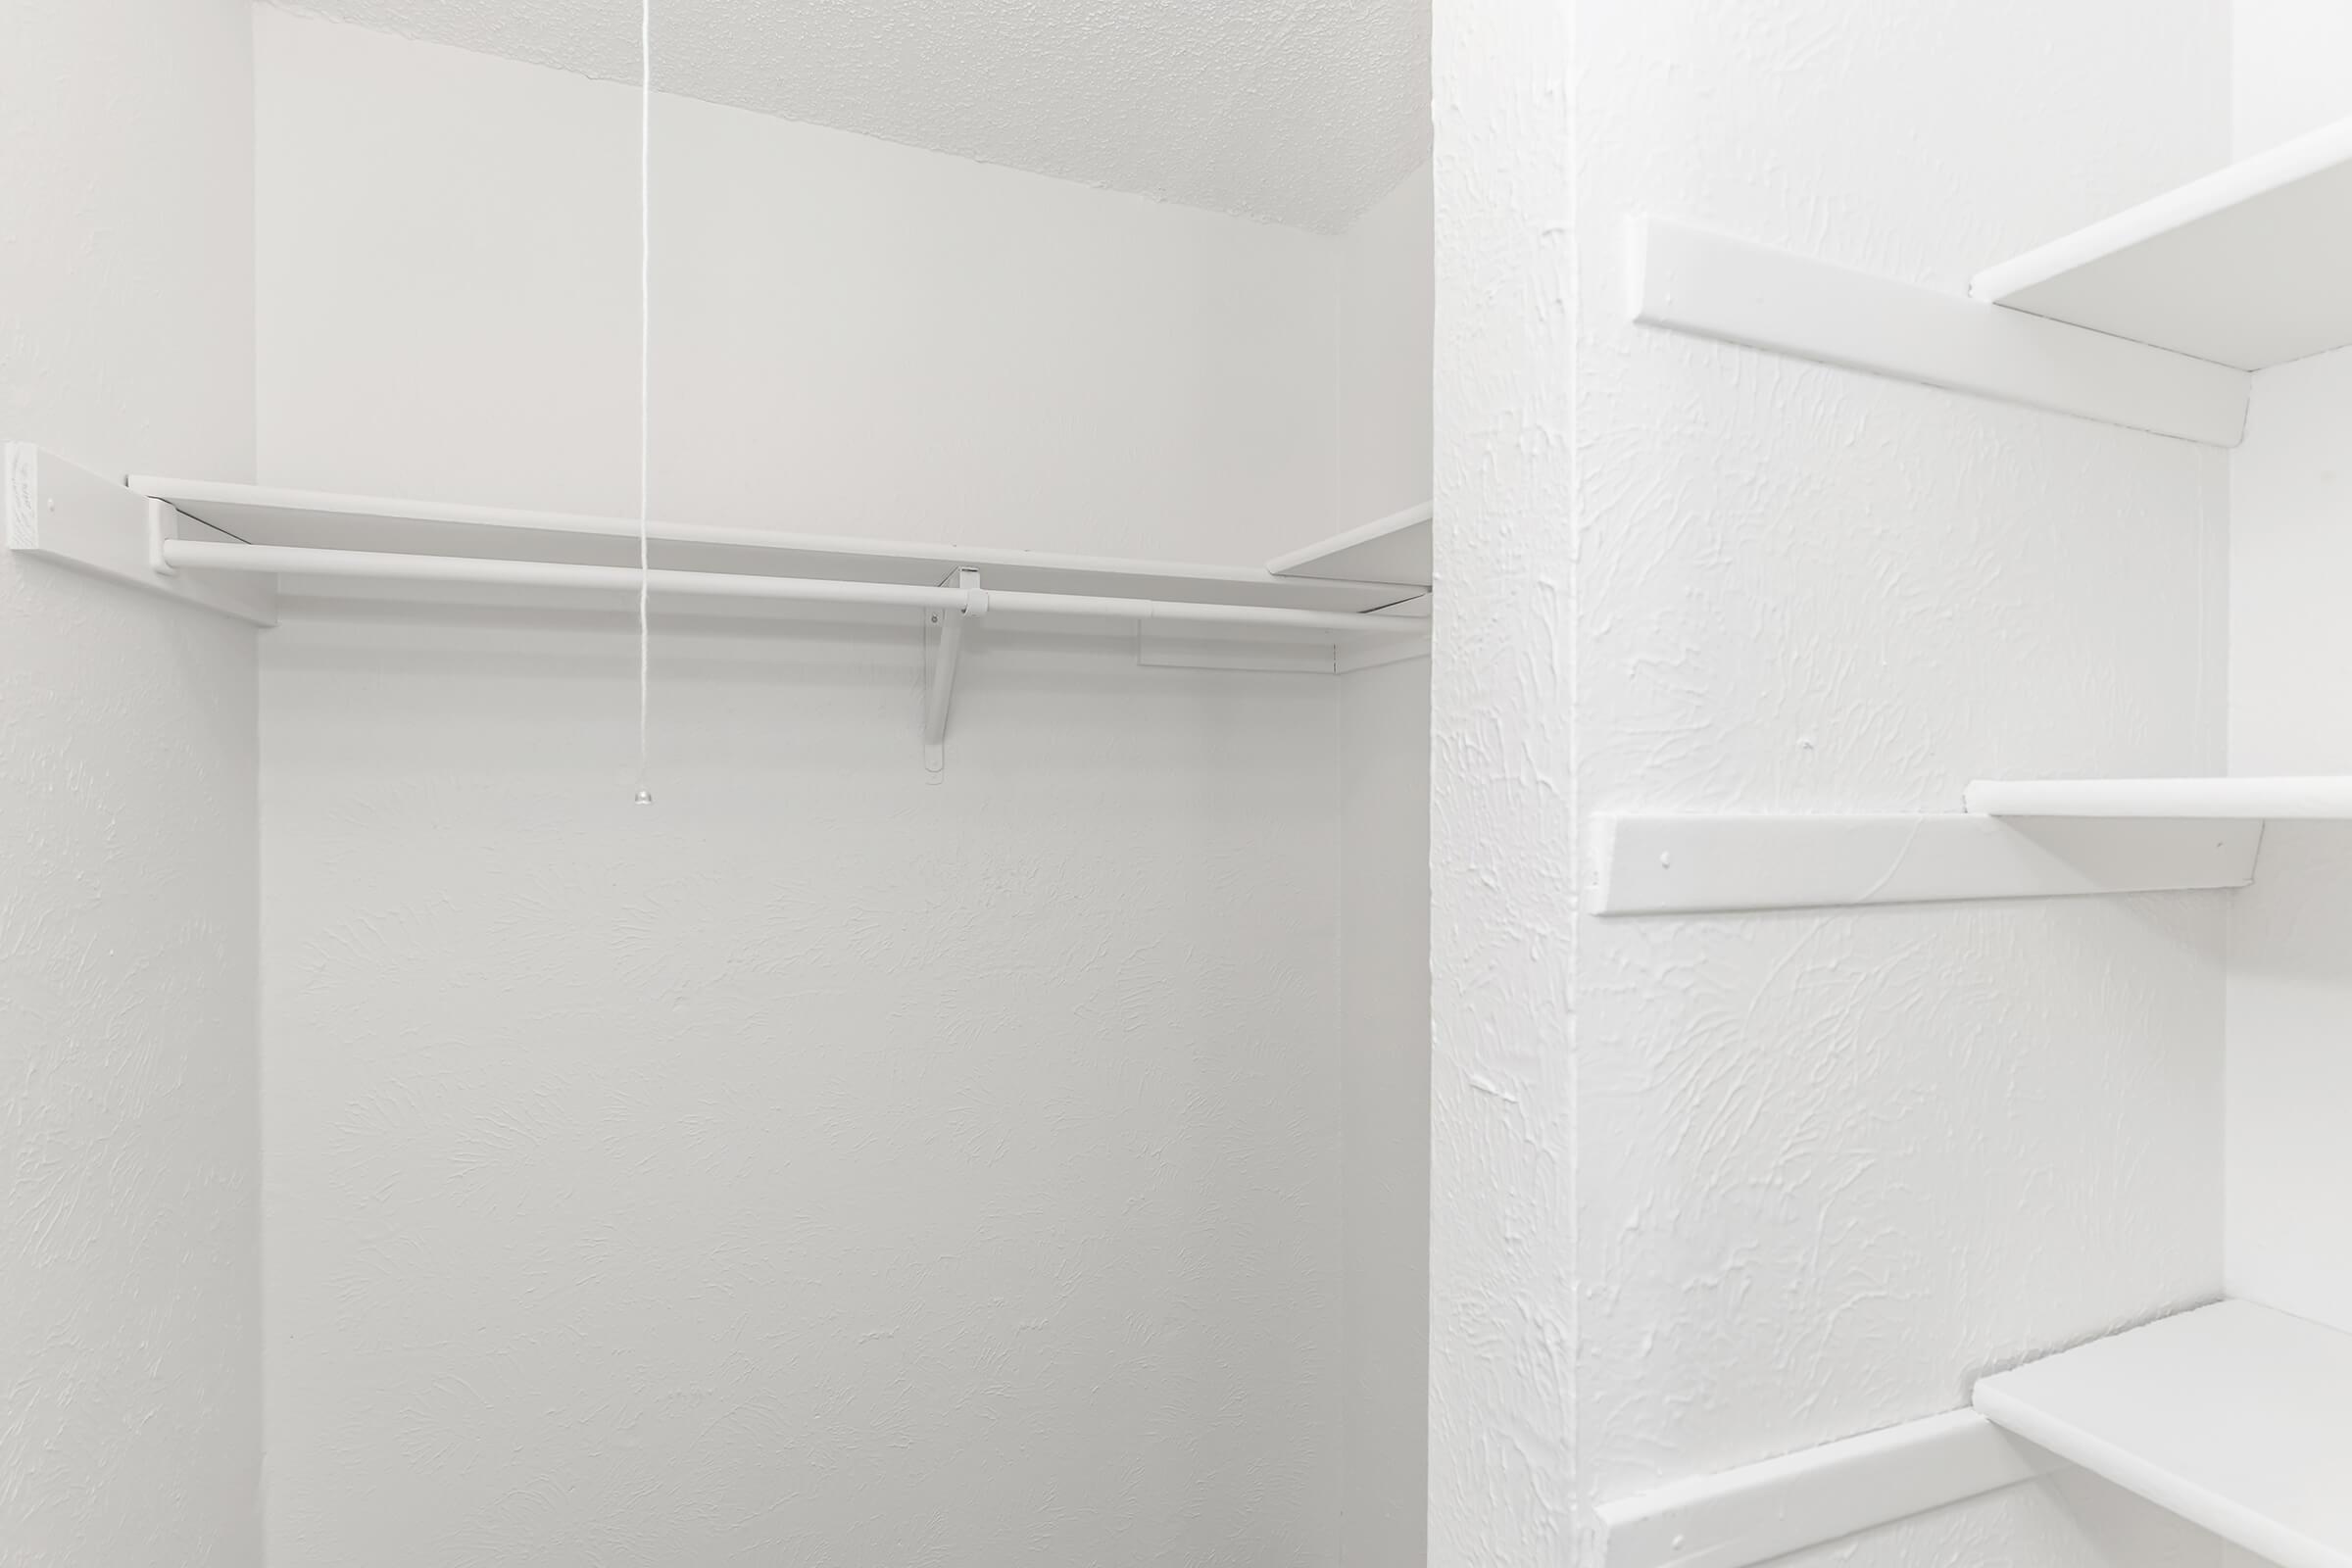 a white refrigerator freezer sitting next to a shower